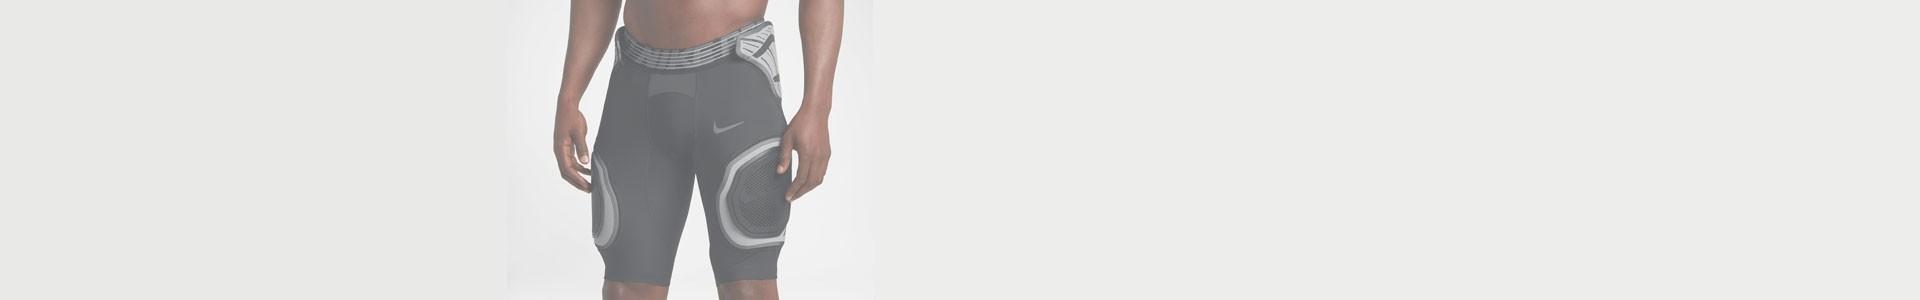 Pantaloncini da Football Americano online | Acquista su AnyGivenSunday.Shop